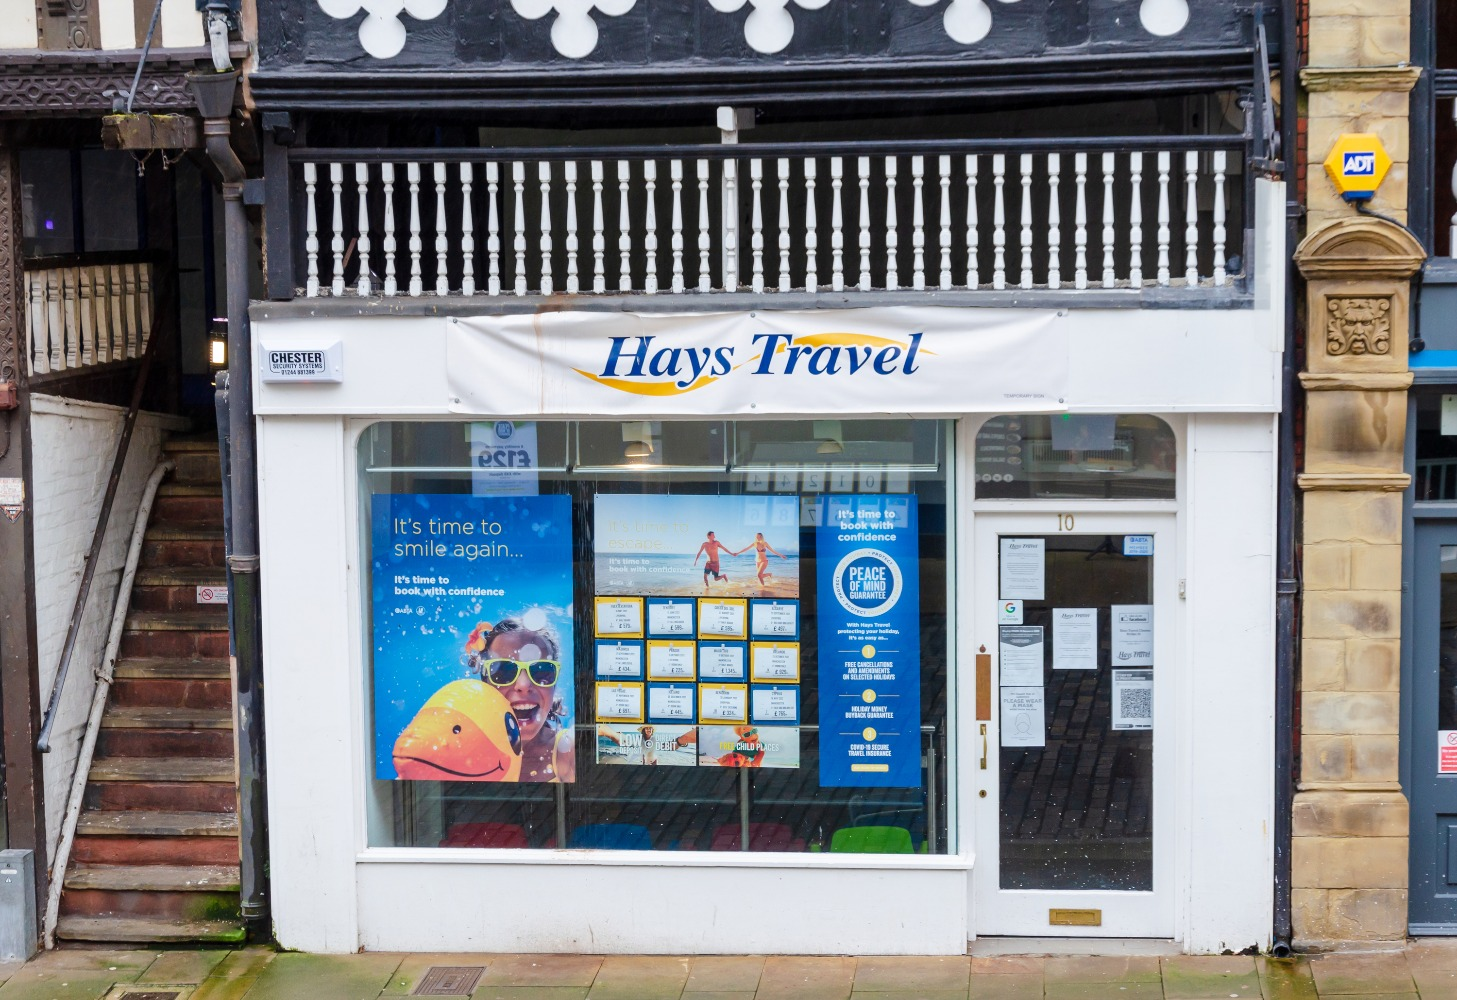 in-store travel agencies